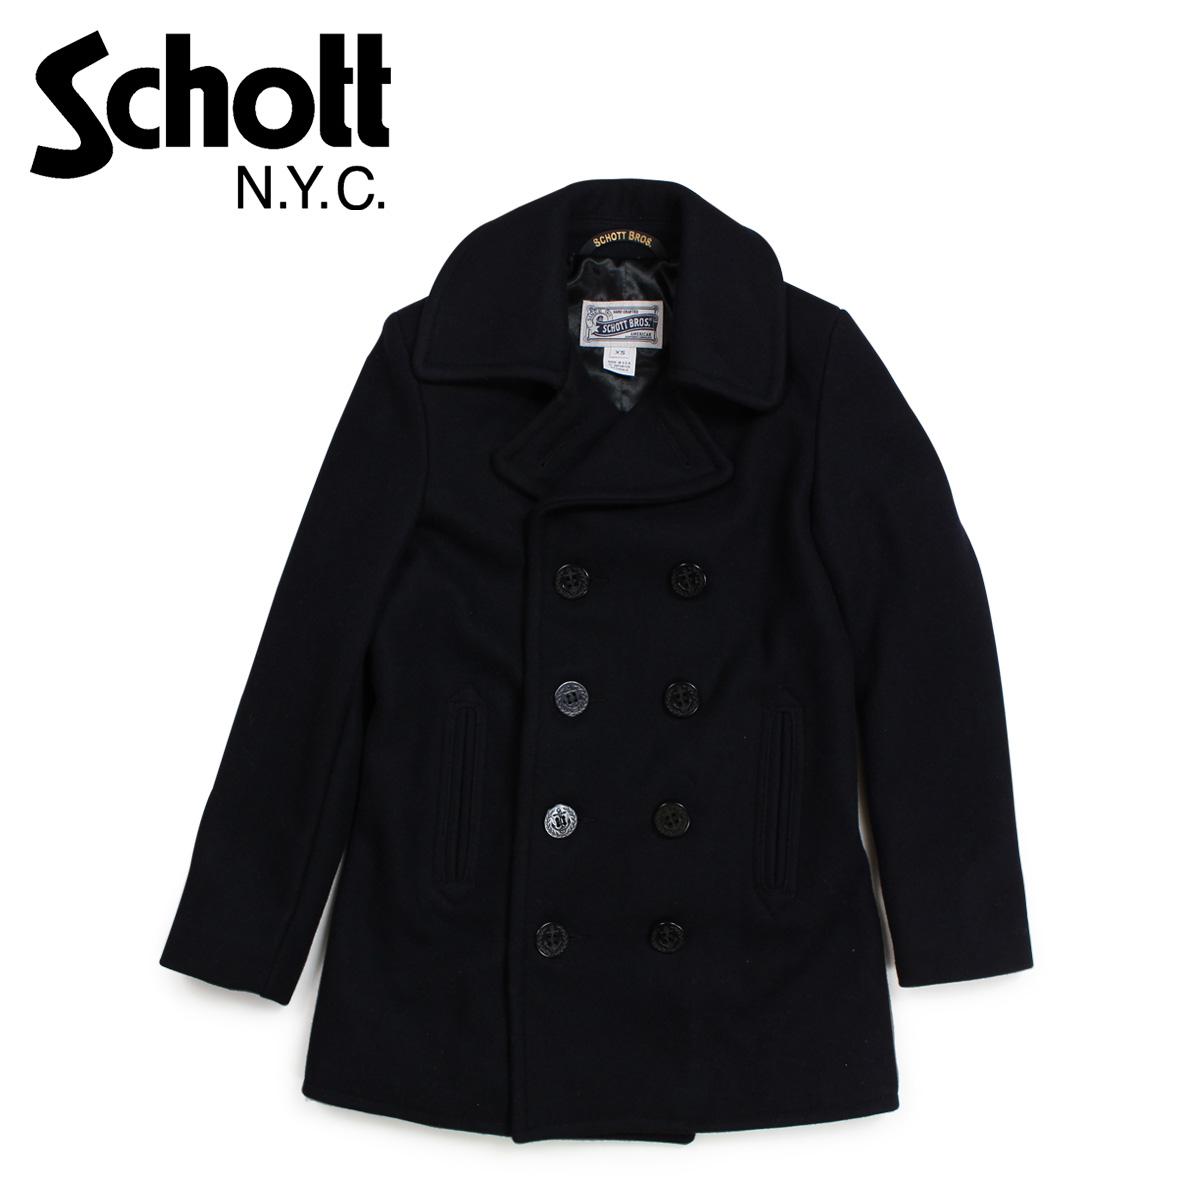 Schott ショット コート Pコート レディース ウール WOMEN'S WOOL PEACOAT ブラック 754W